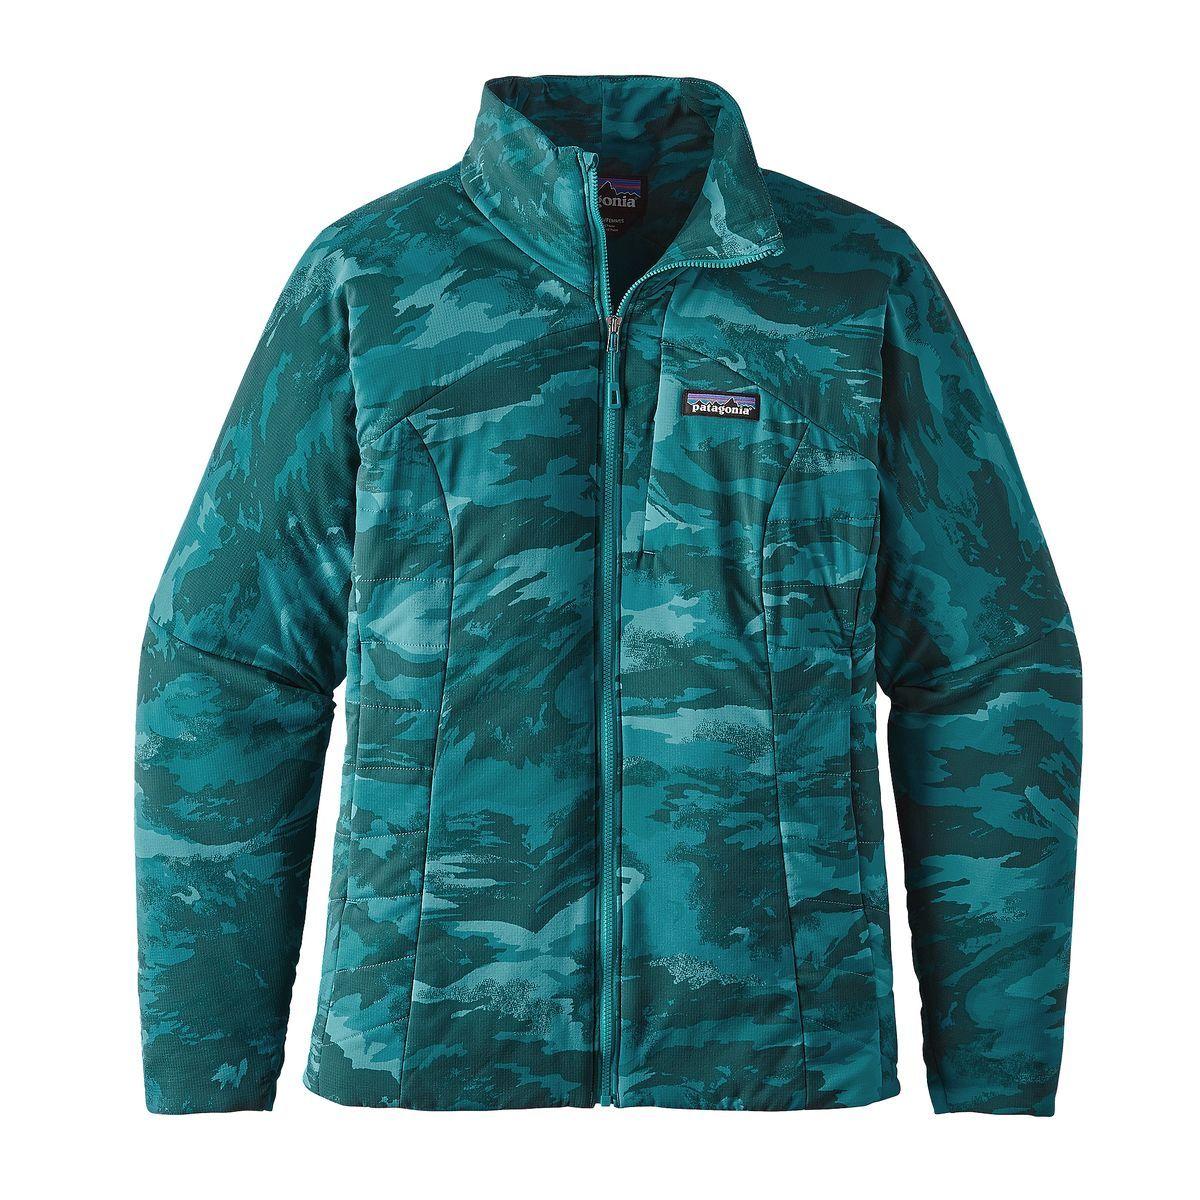 Patagonia Women's NanoAir® Jacket Patagonia nano air